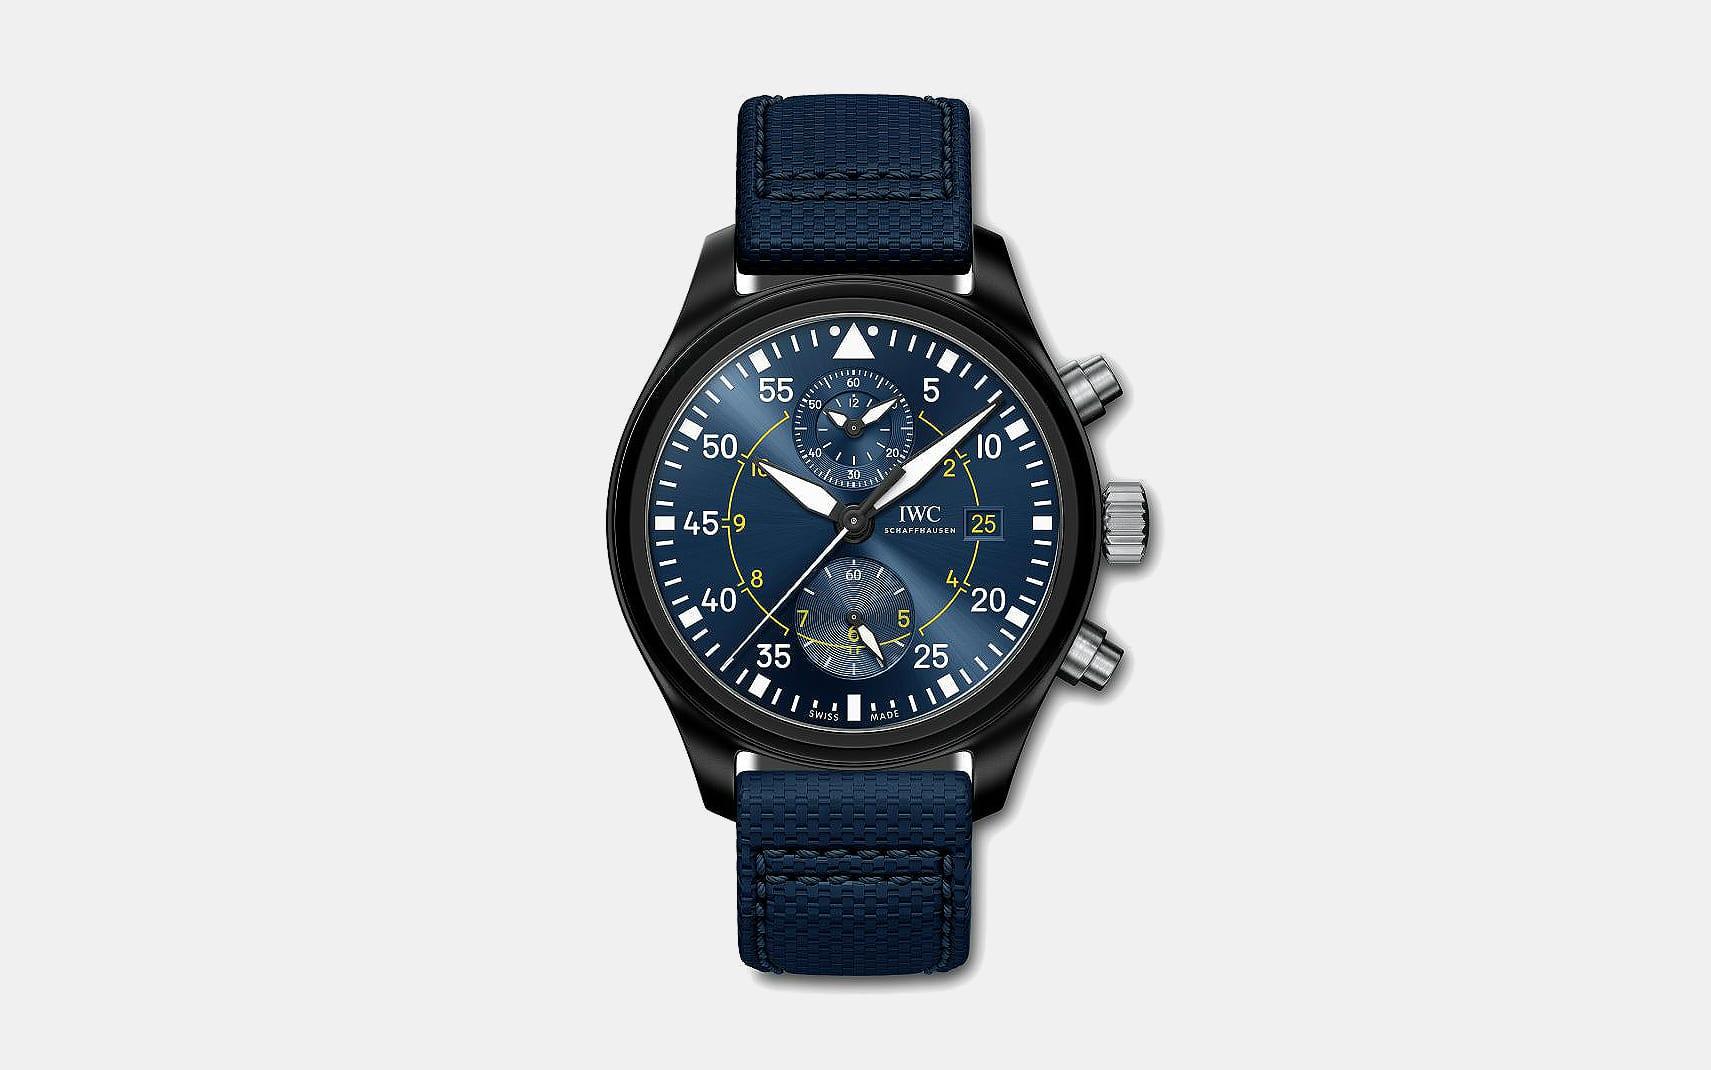 IWC Blue Angels Chronograph Pilot's Watch